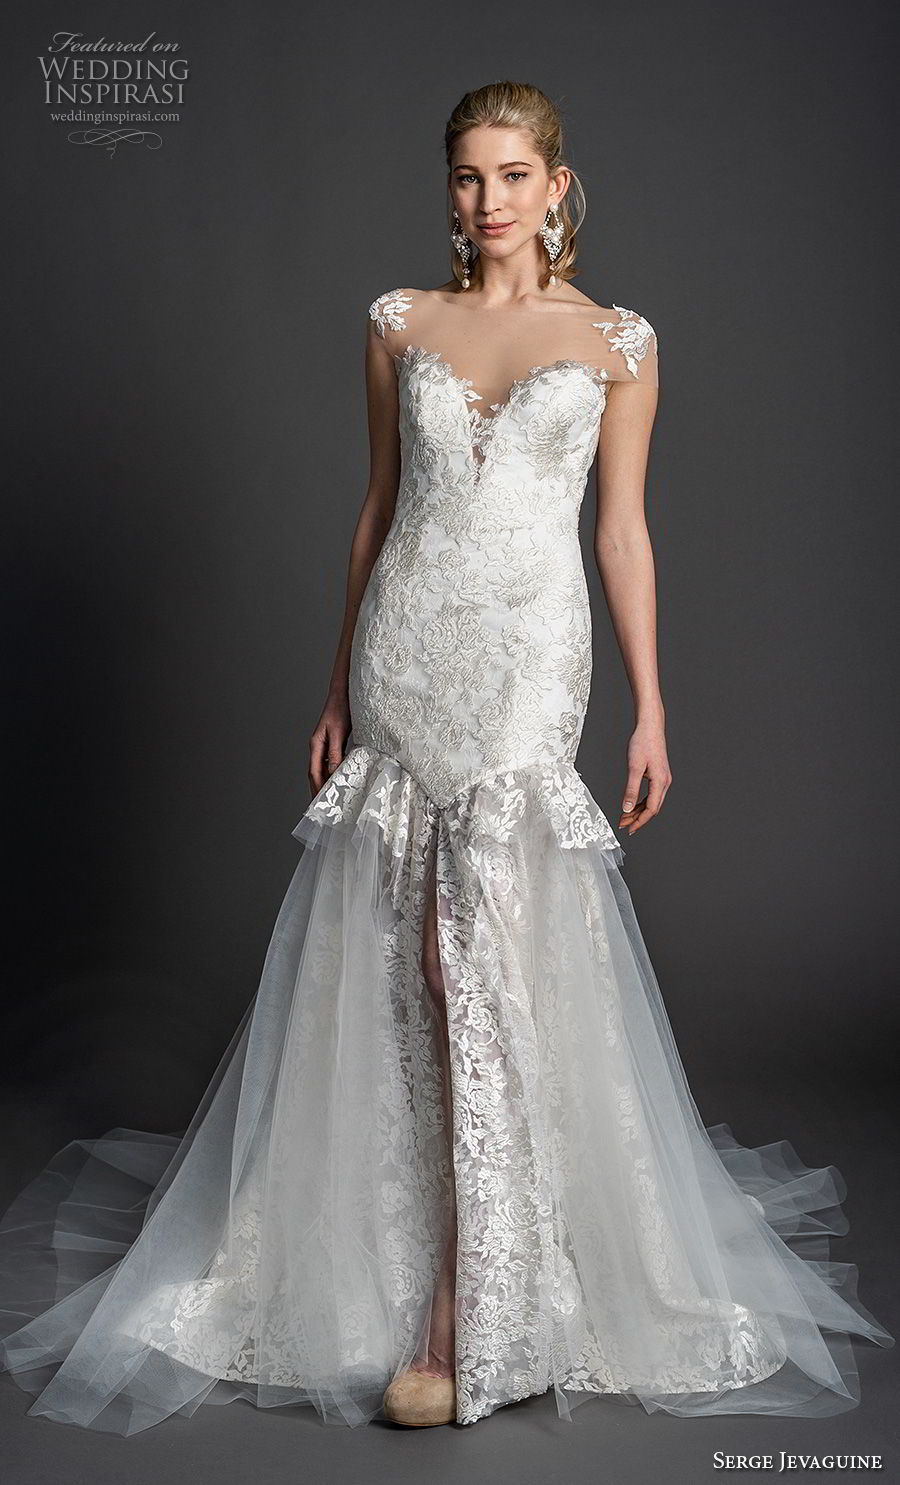 serge jevaguine 2019 bridal cap sleeves illusion bateau deep sweetheart neckline full embellishment elegant mermaid wedding dress open back chapel train (2) mv